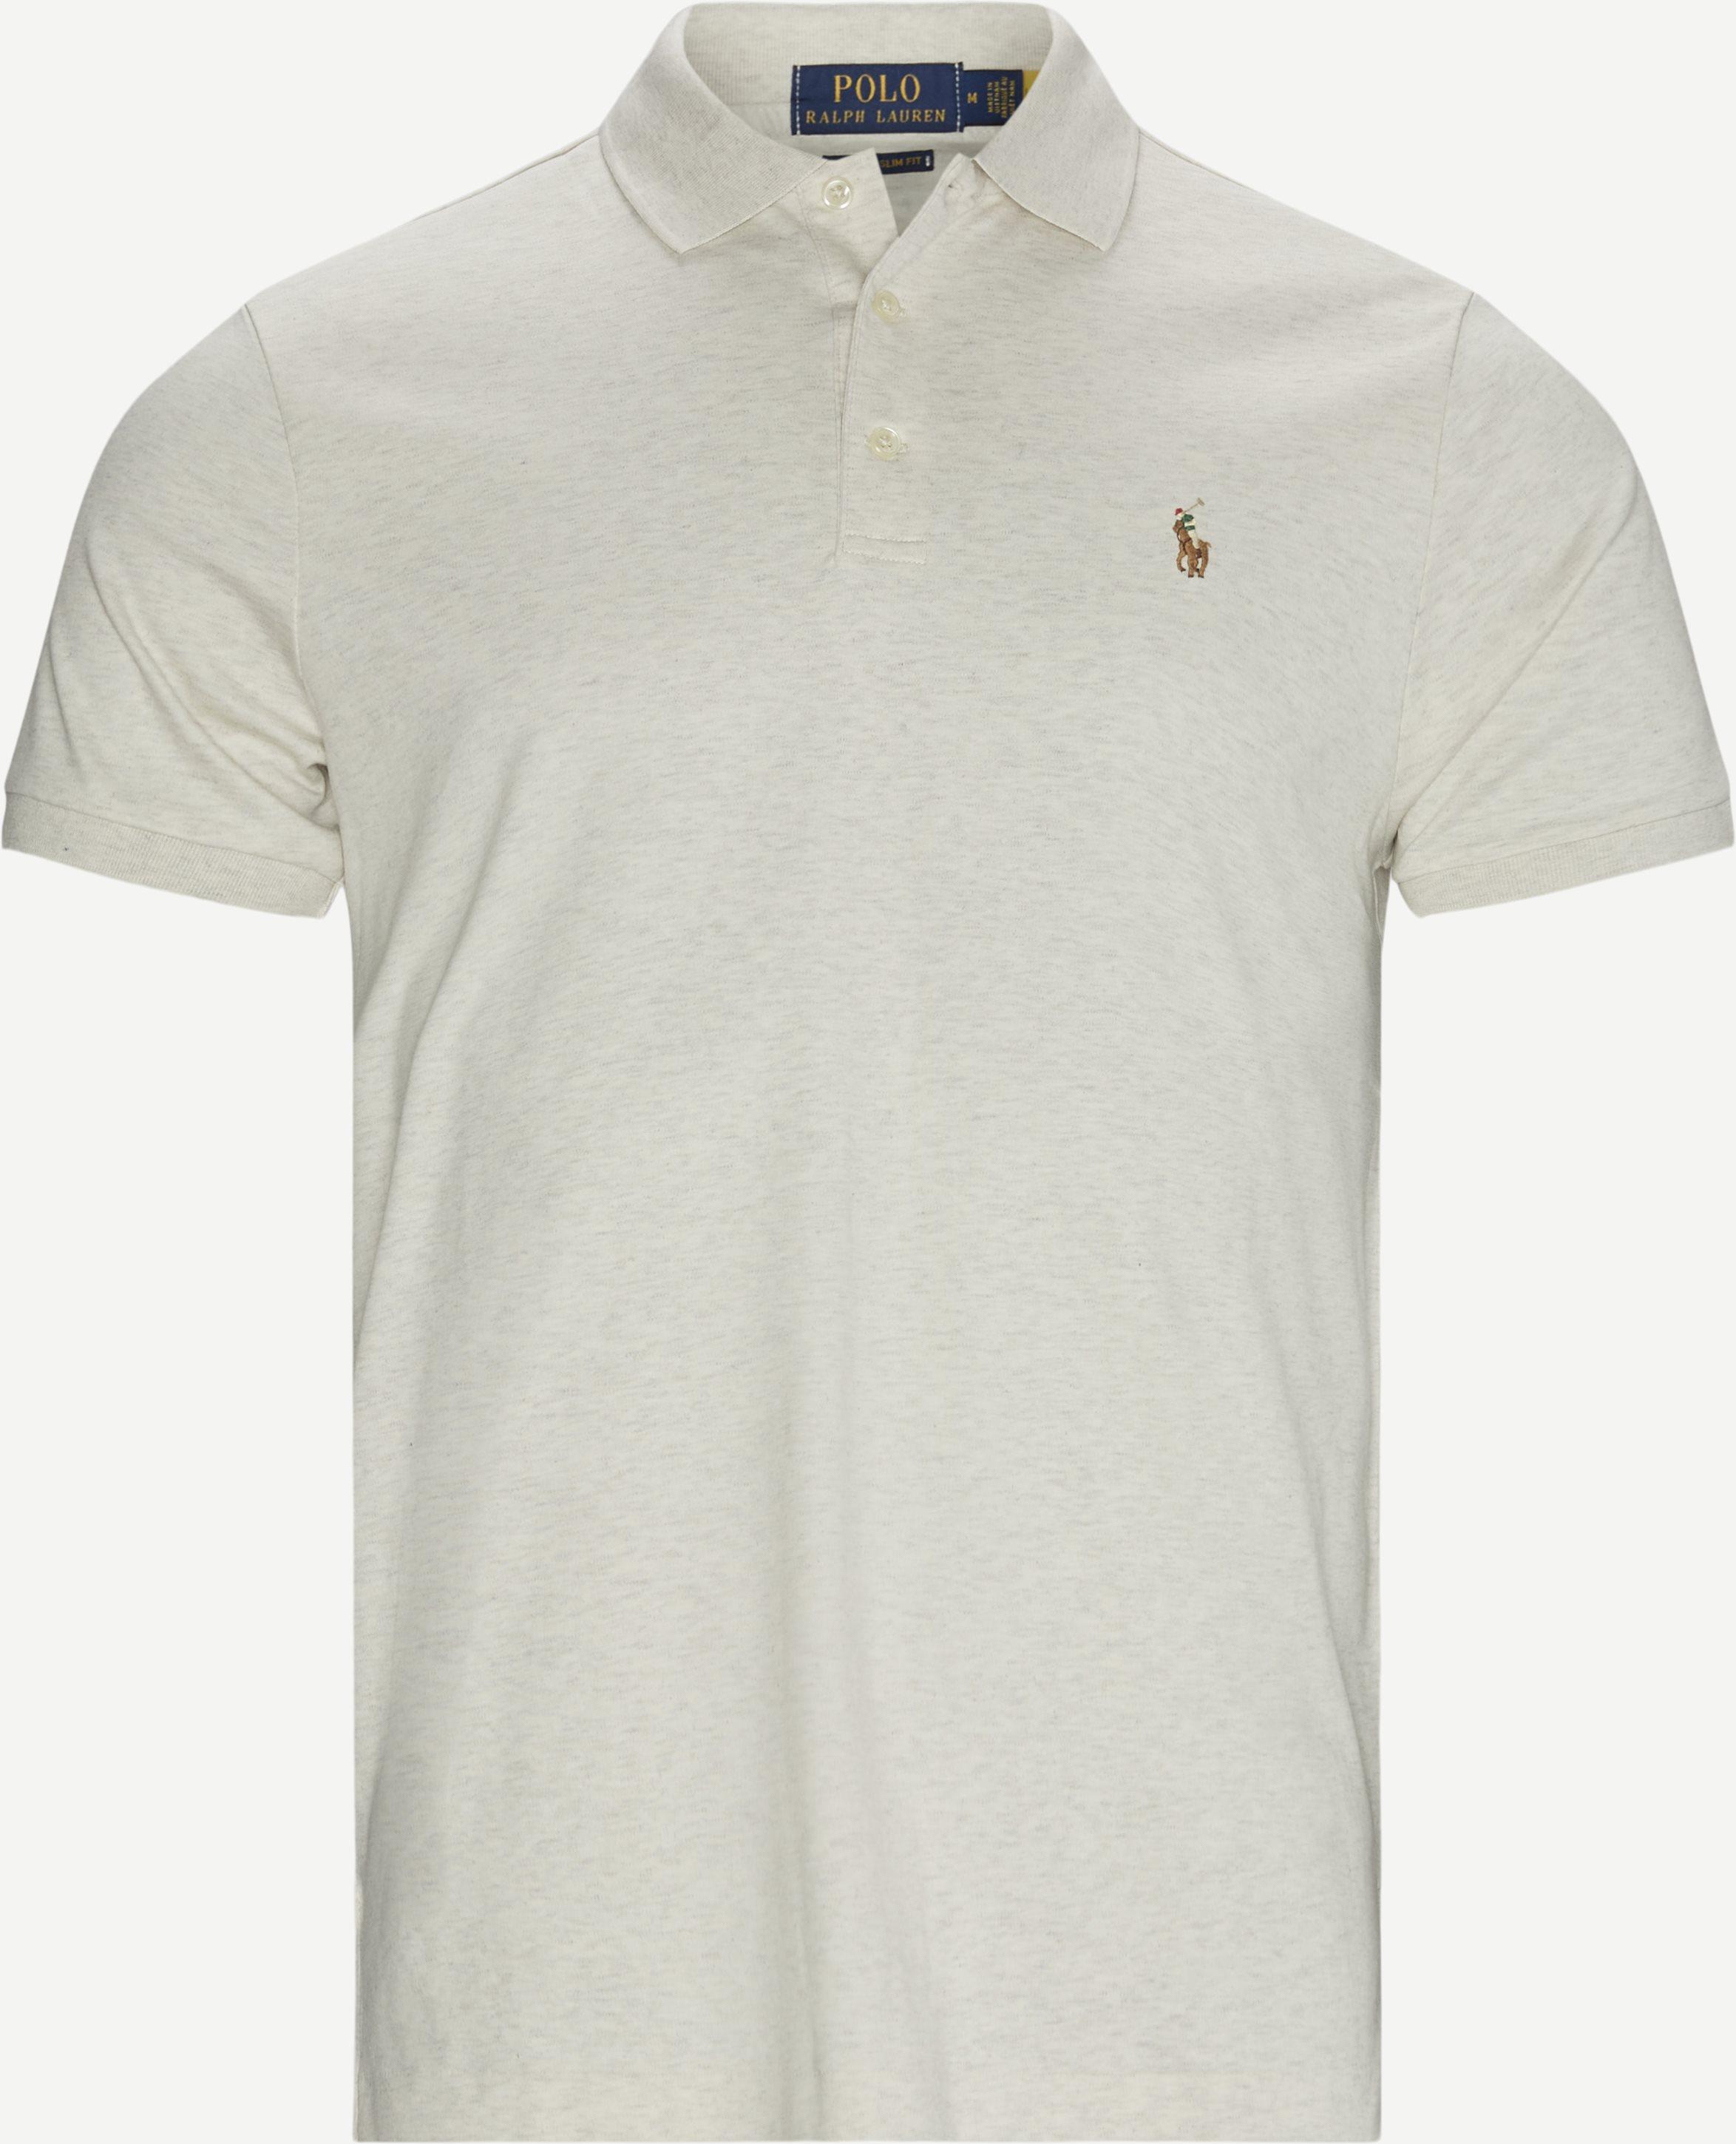 T-shirts - Regular slim fit - Sand